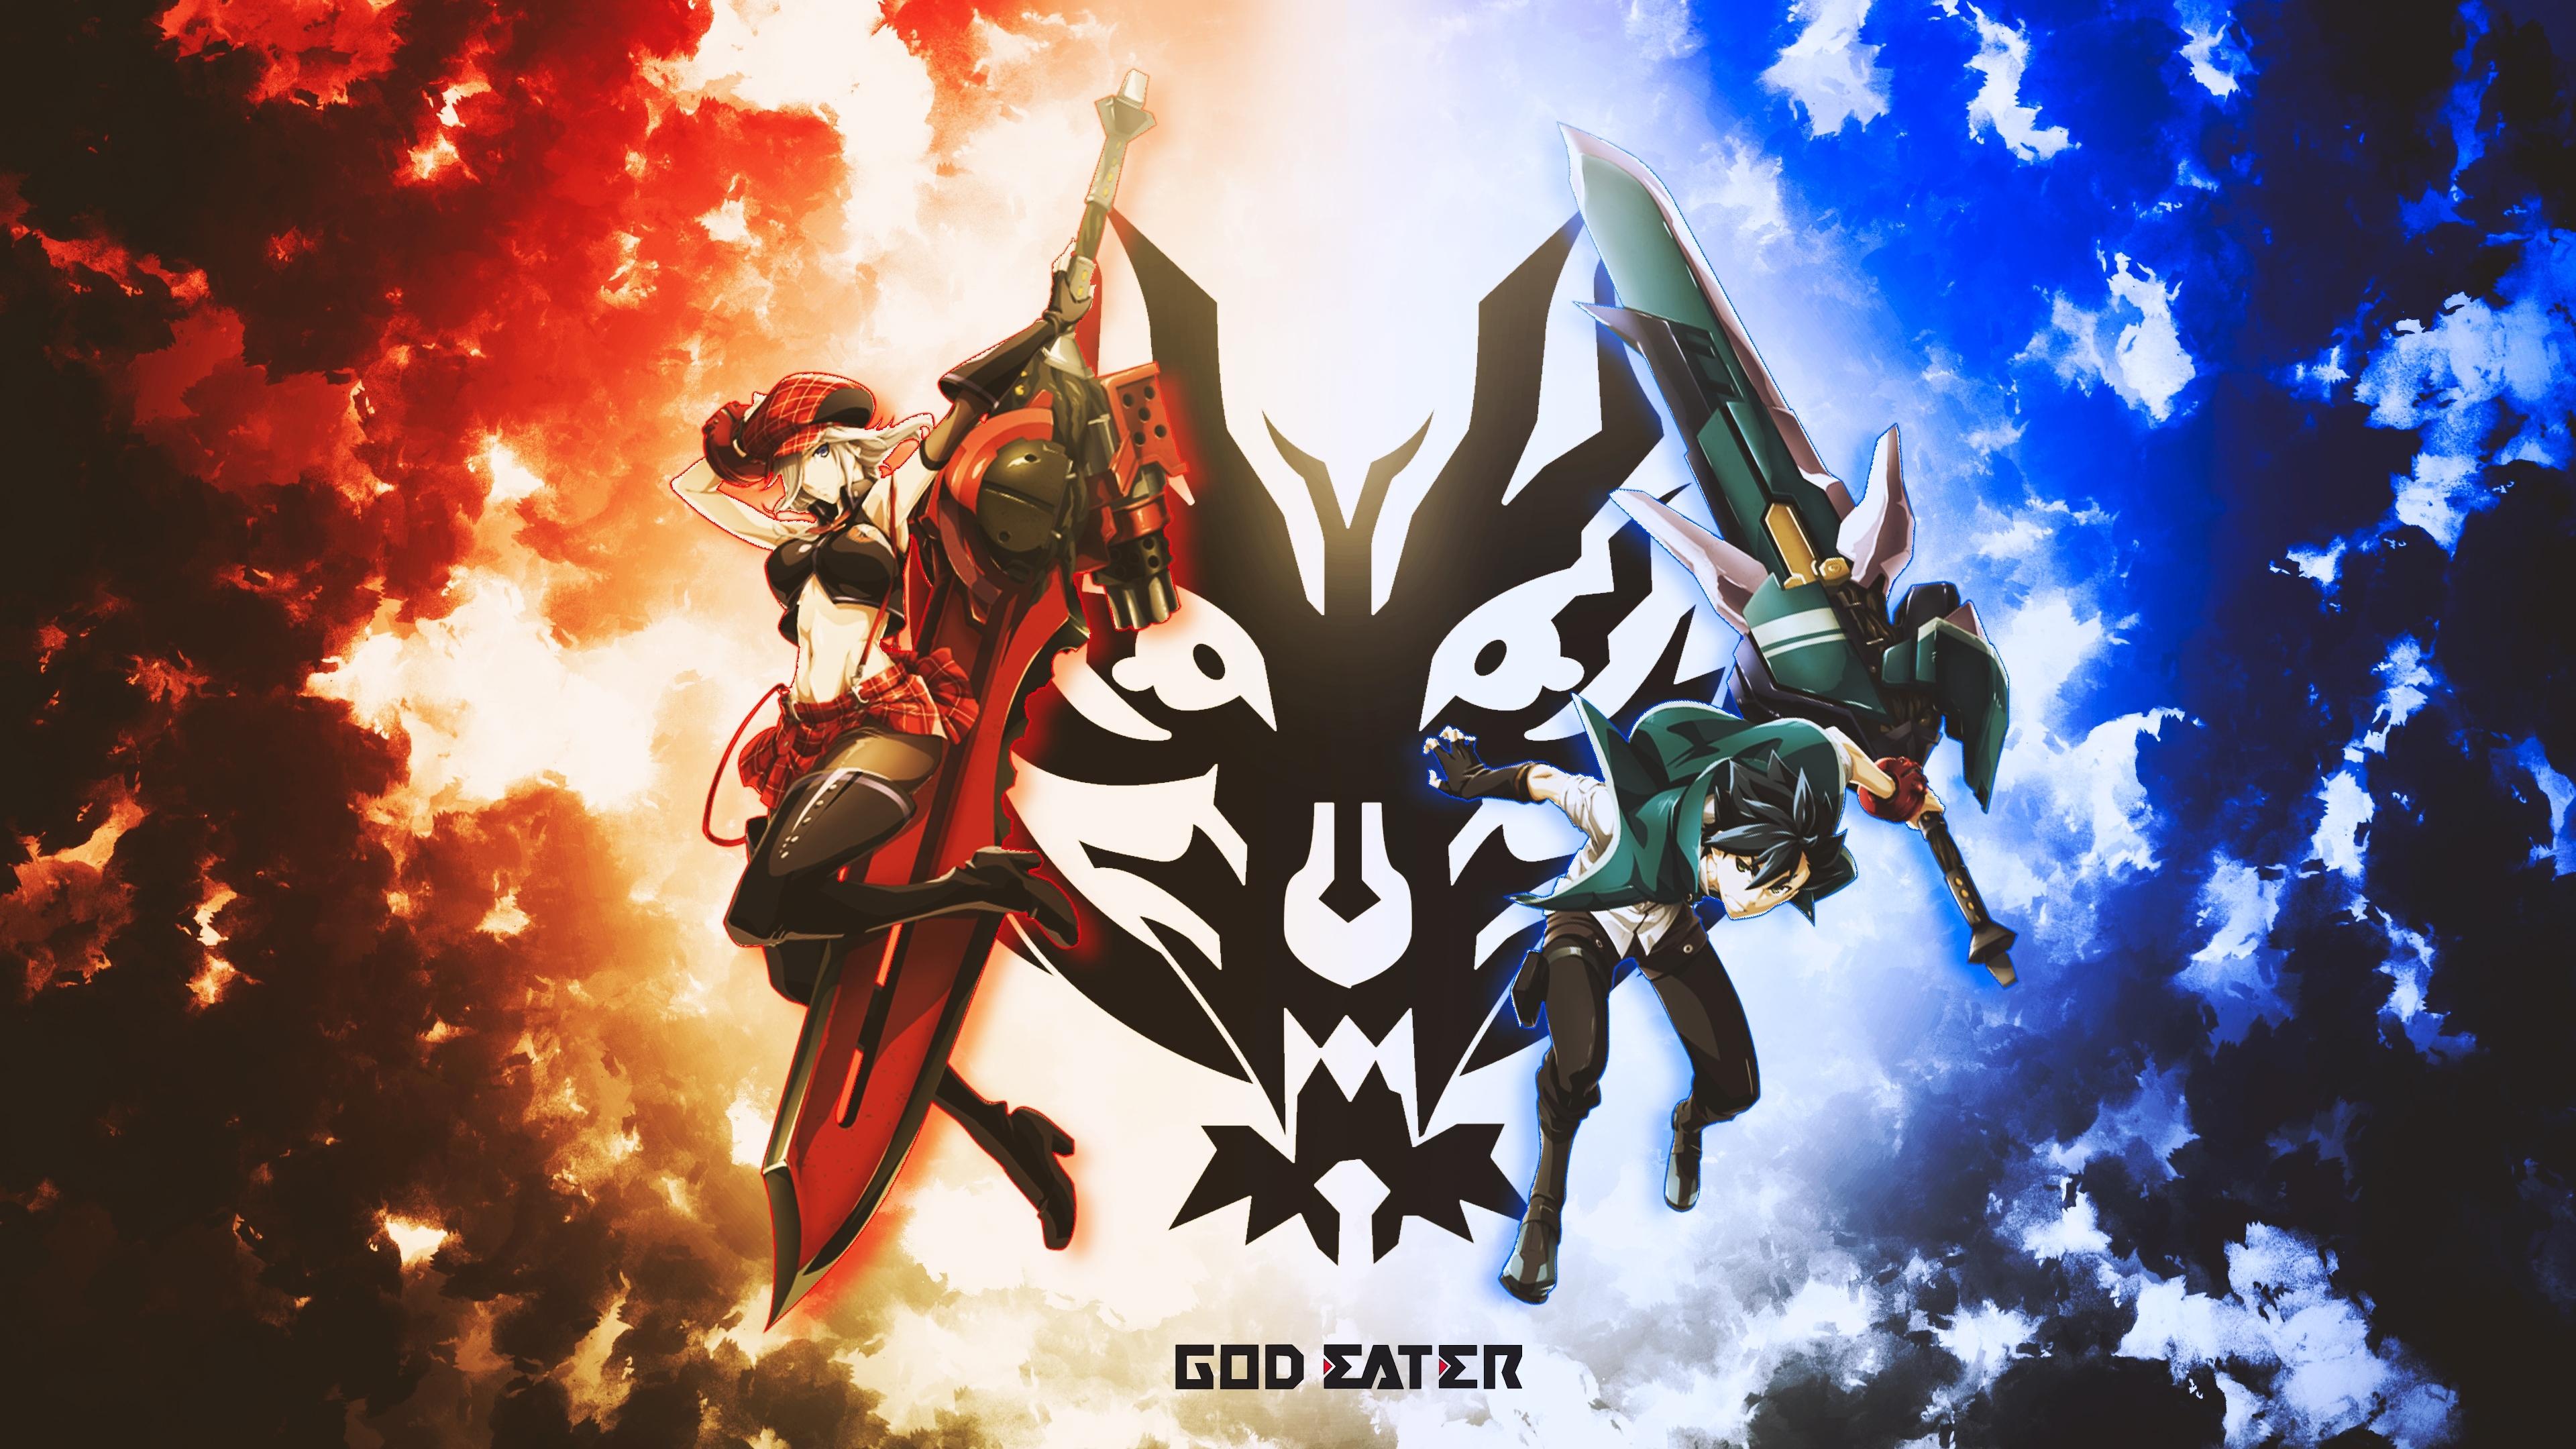 god eater 4k ultra hd fond d'écran and arrière-plan | 3840x2160 | id